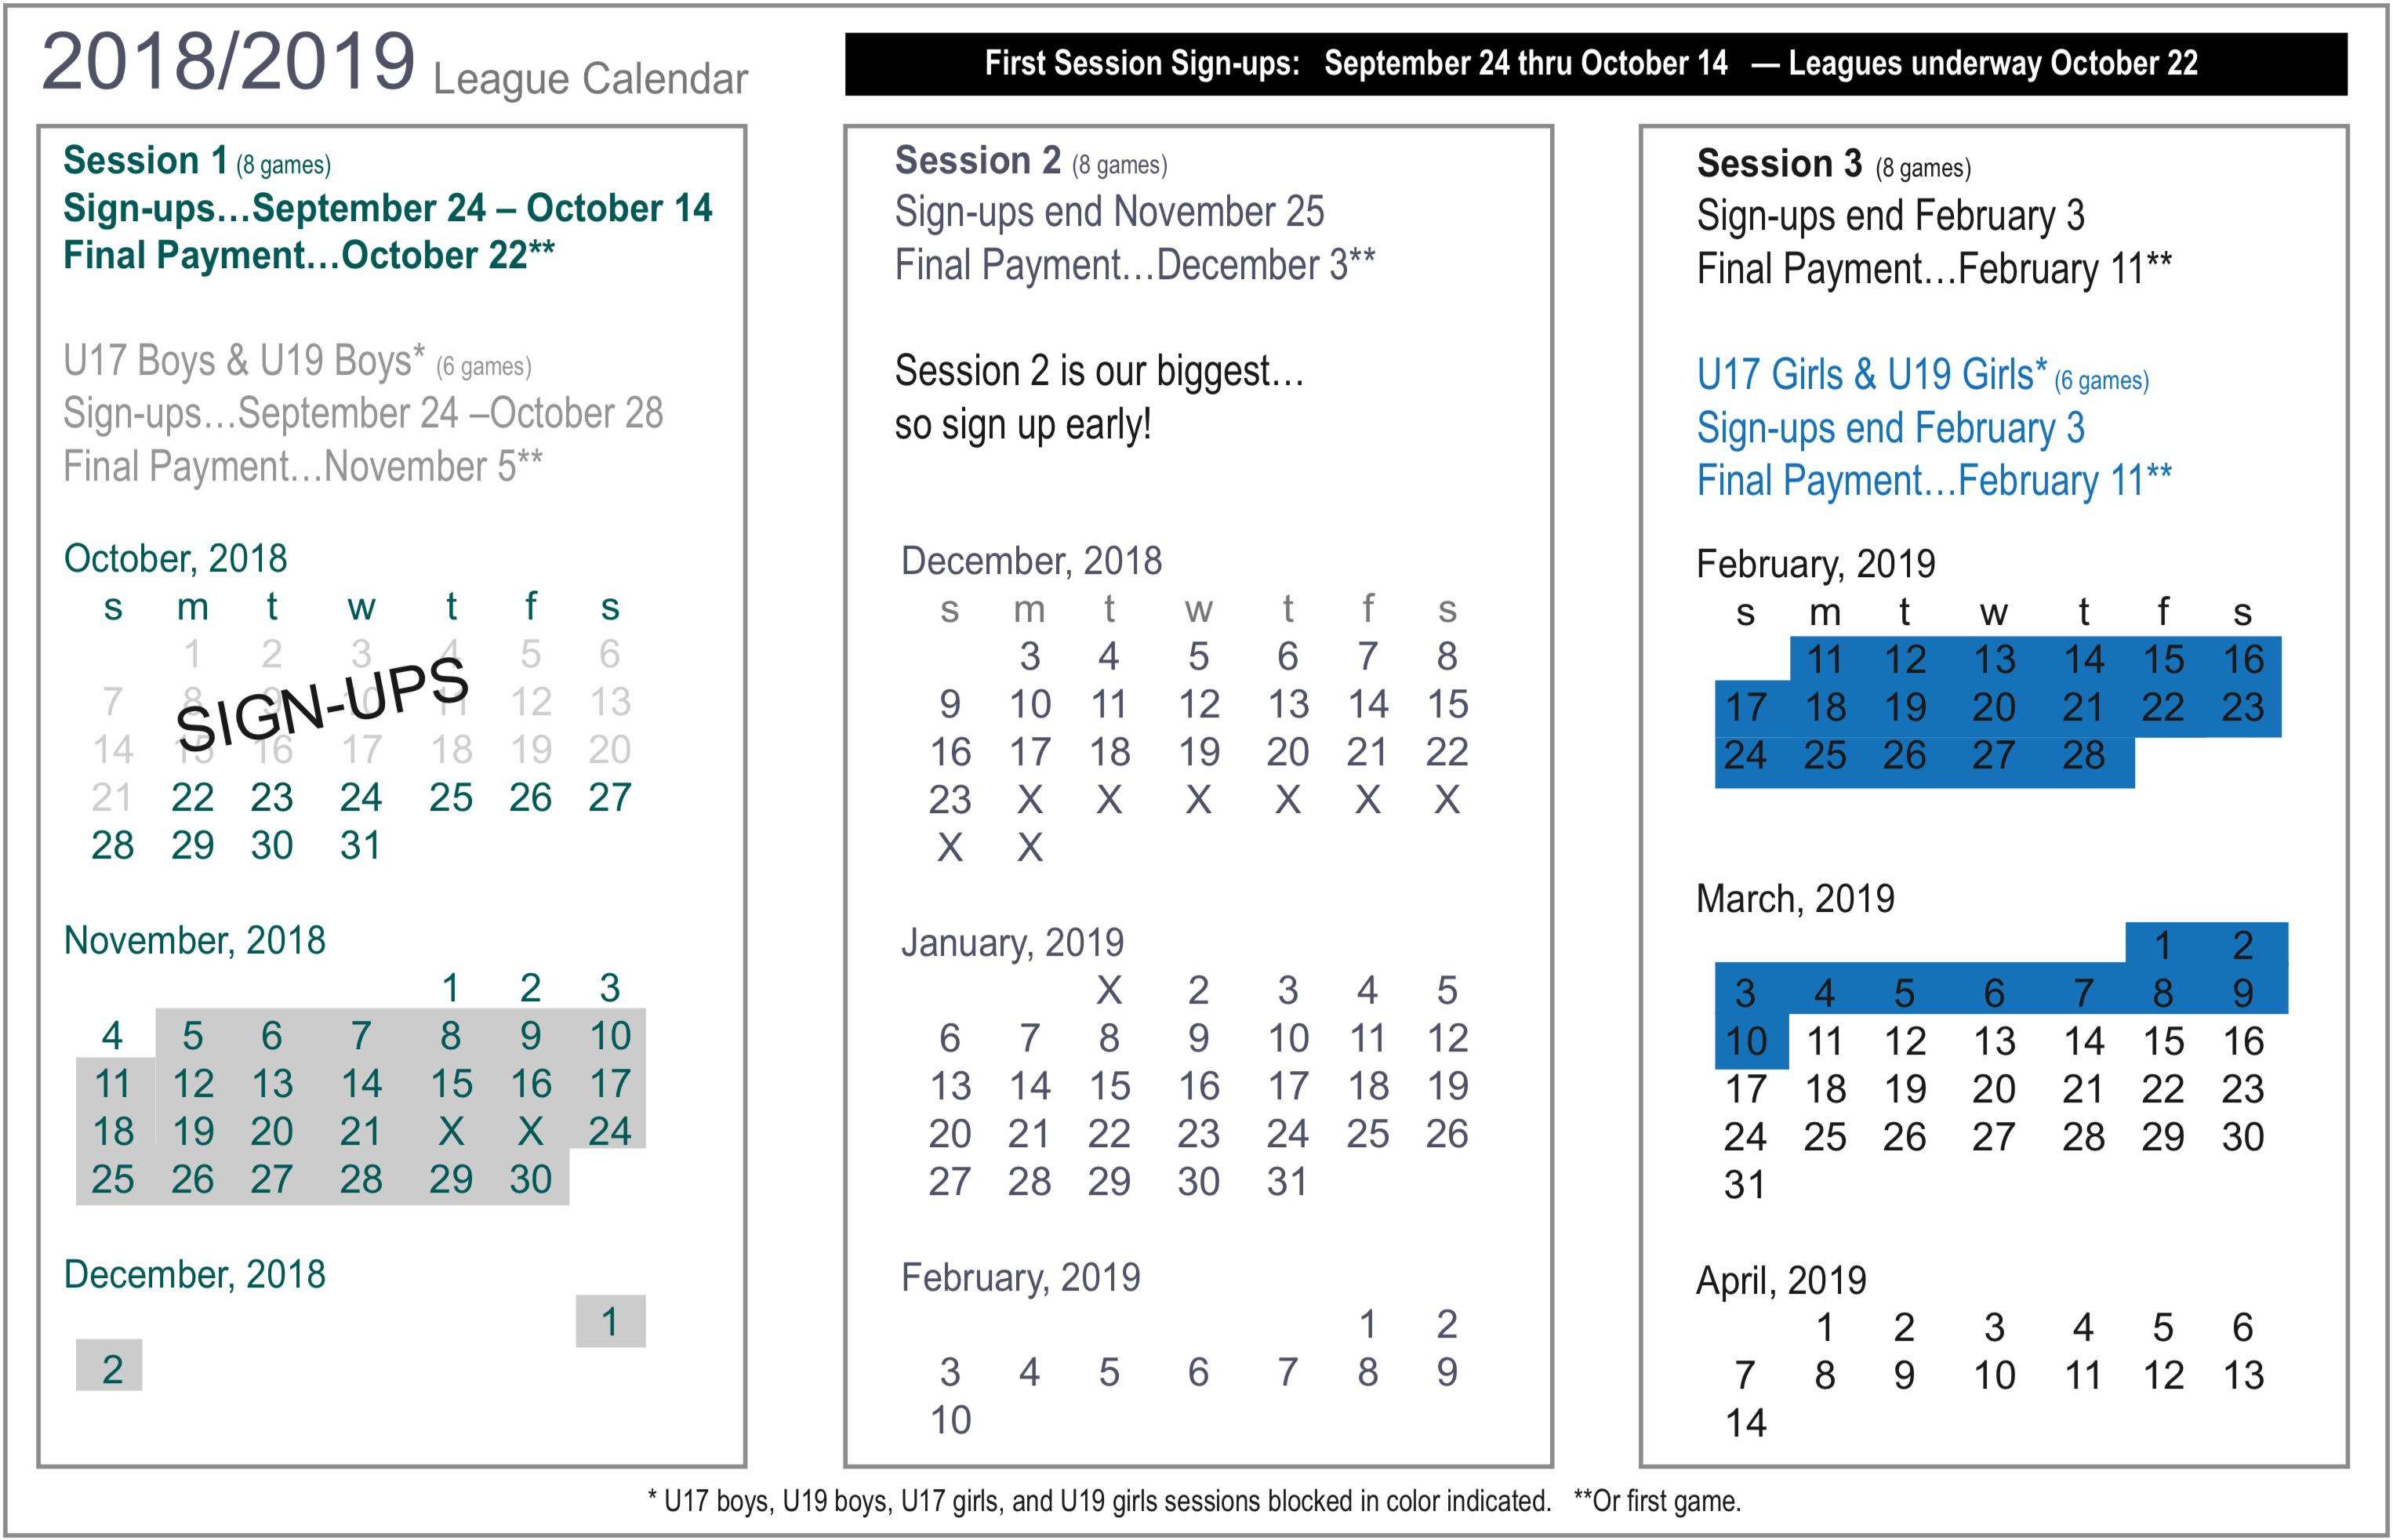 League_Calendar